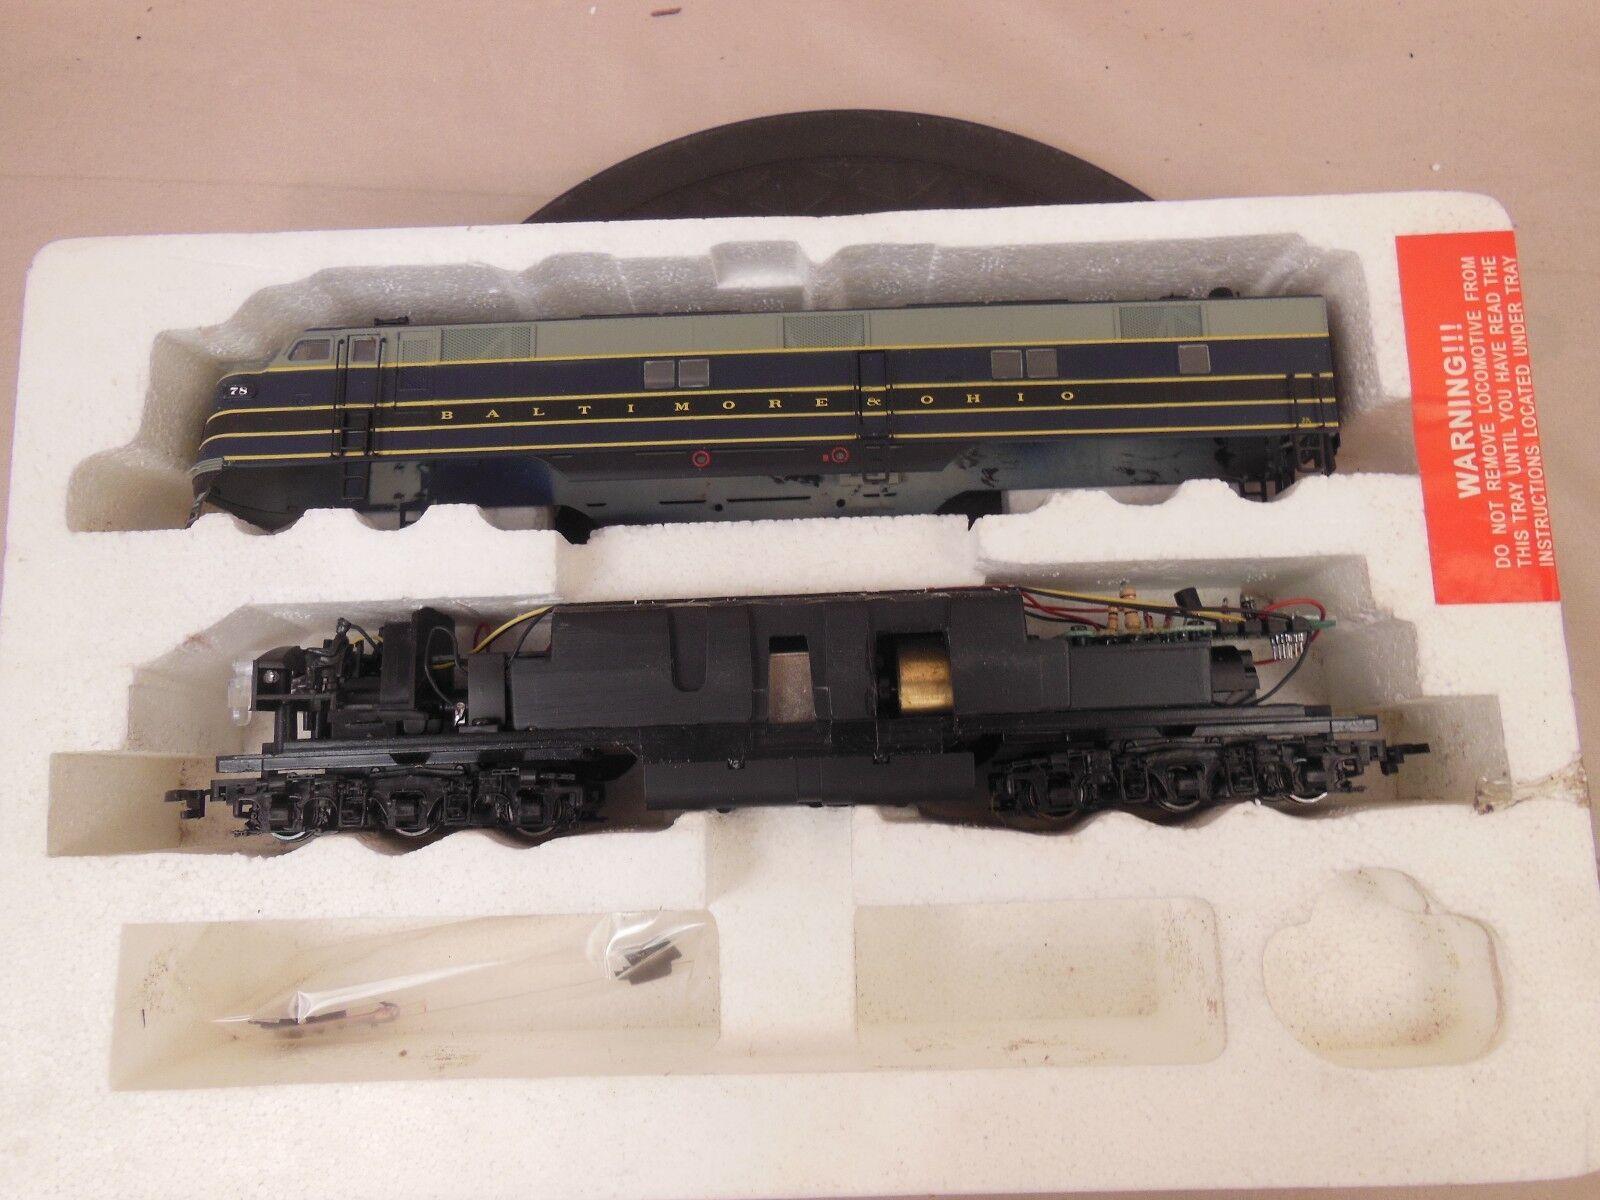 Ho Proto 2018 Baltimore & Ohio Locomotora E7 78